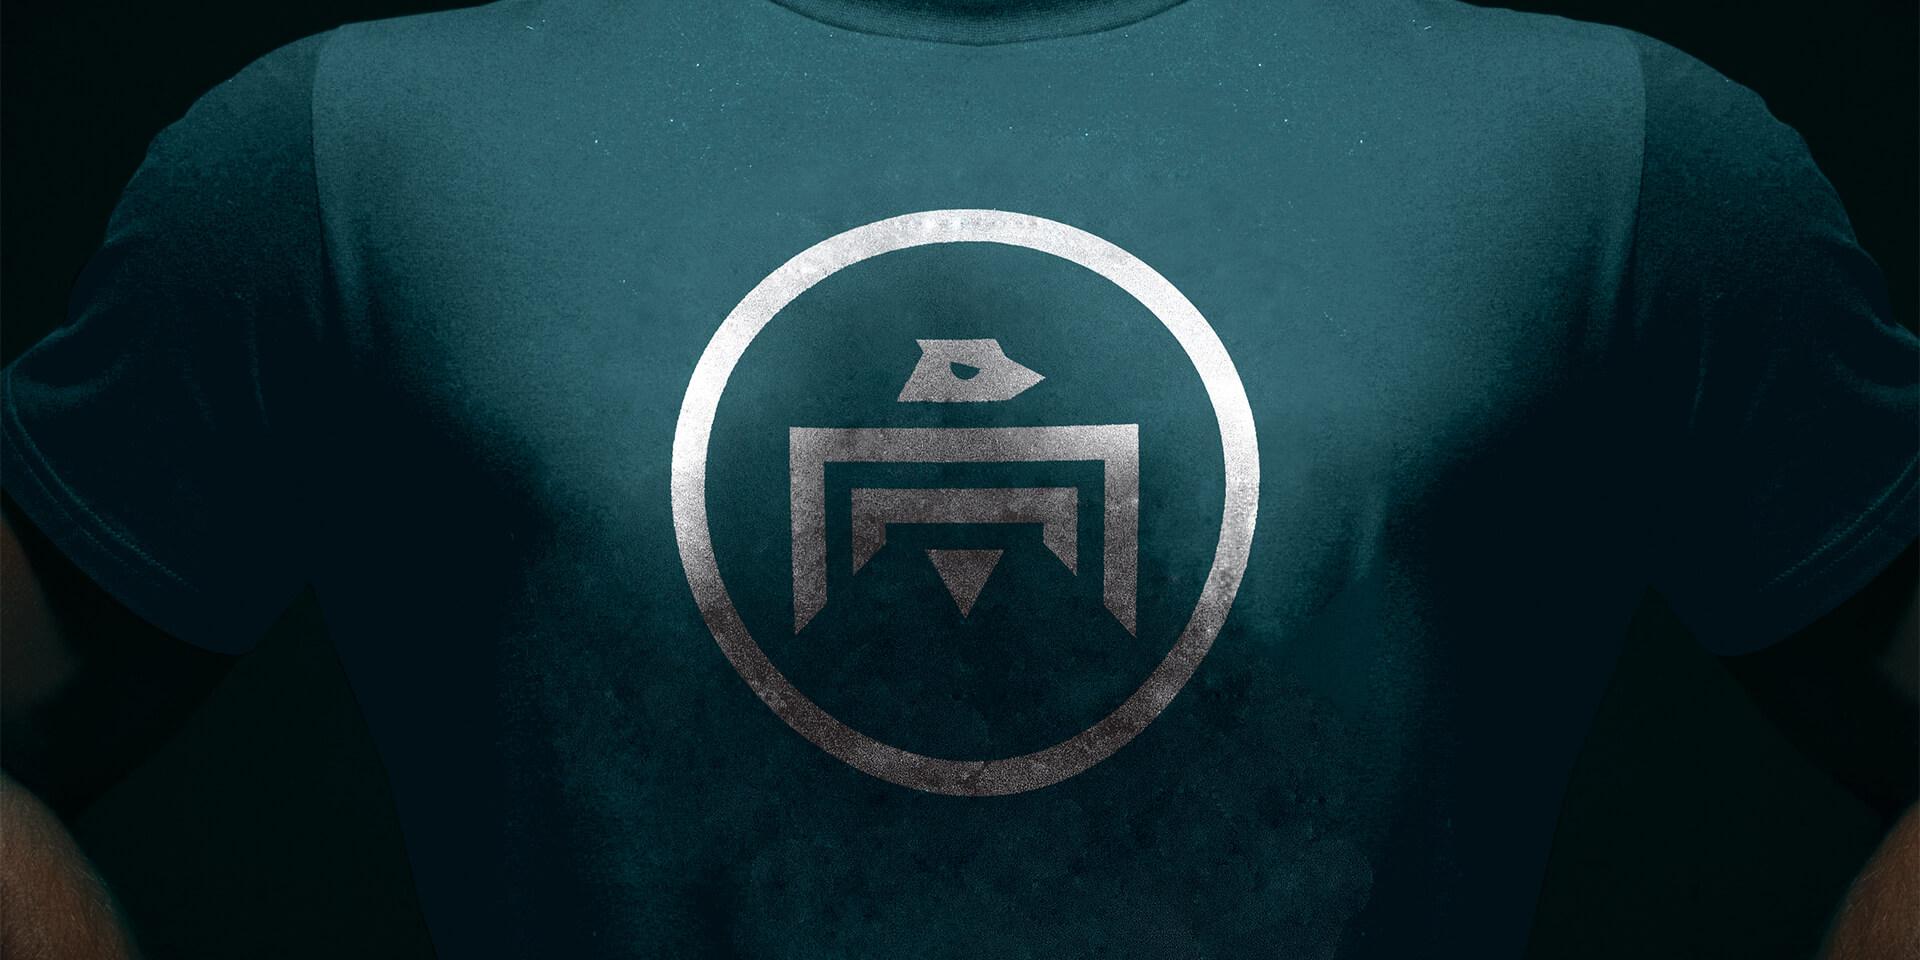 totem-strength-buff-shirt